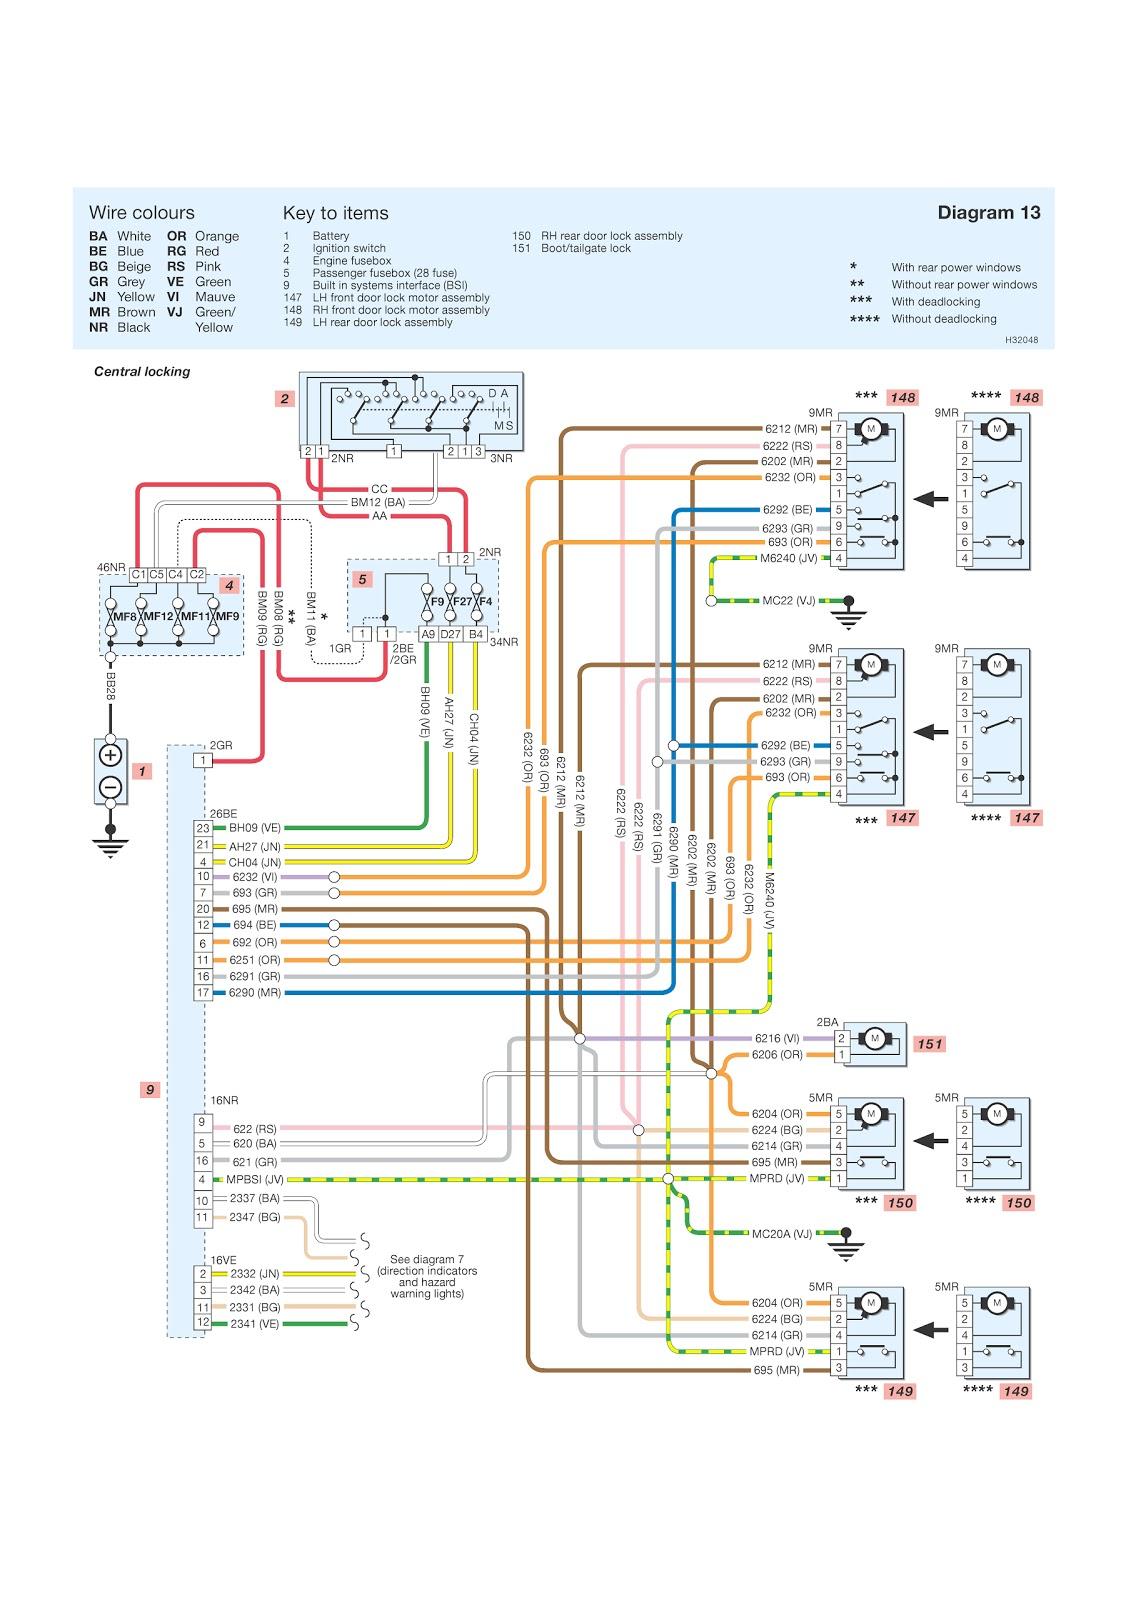 206 central locking wiring diagram